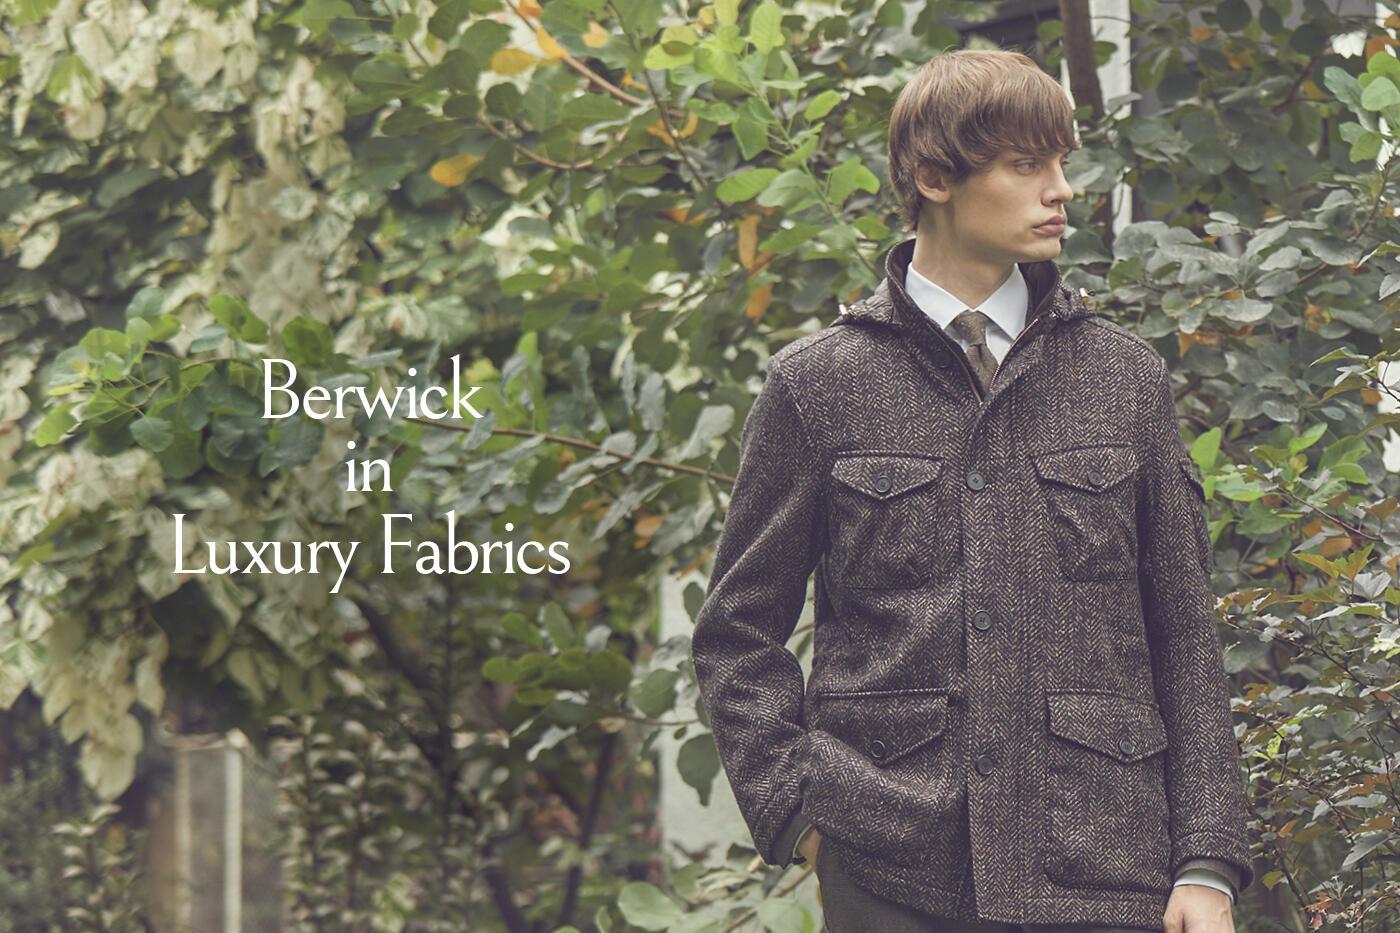 Berwick in Luxury Fabrics